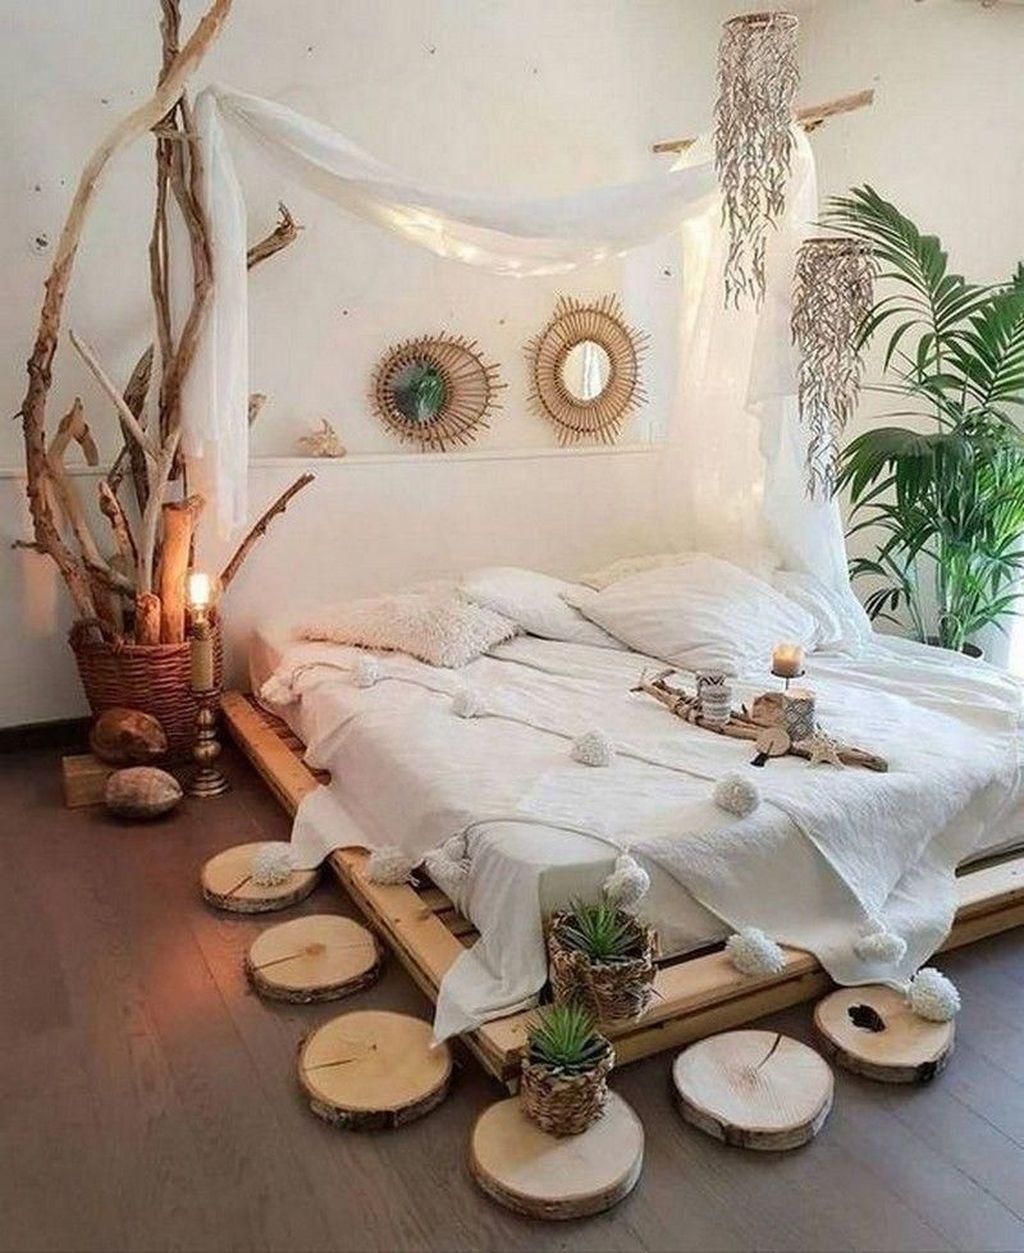 Awesome Boho Chic Bedroom Decor Ideas 02